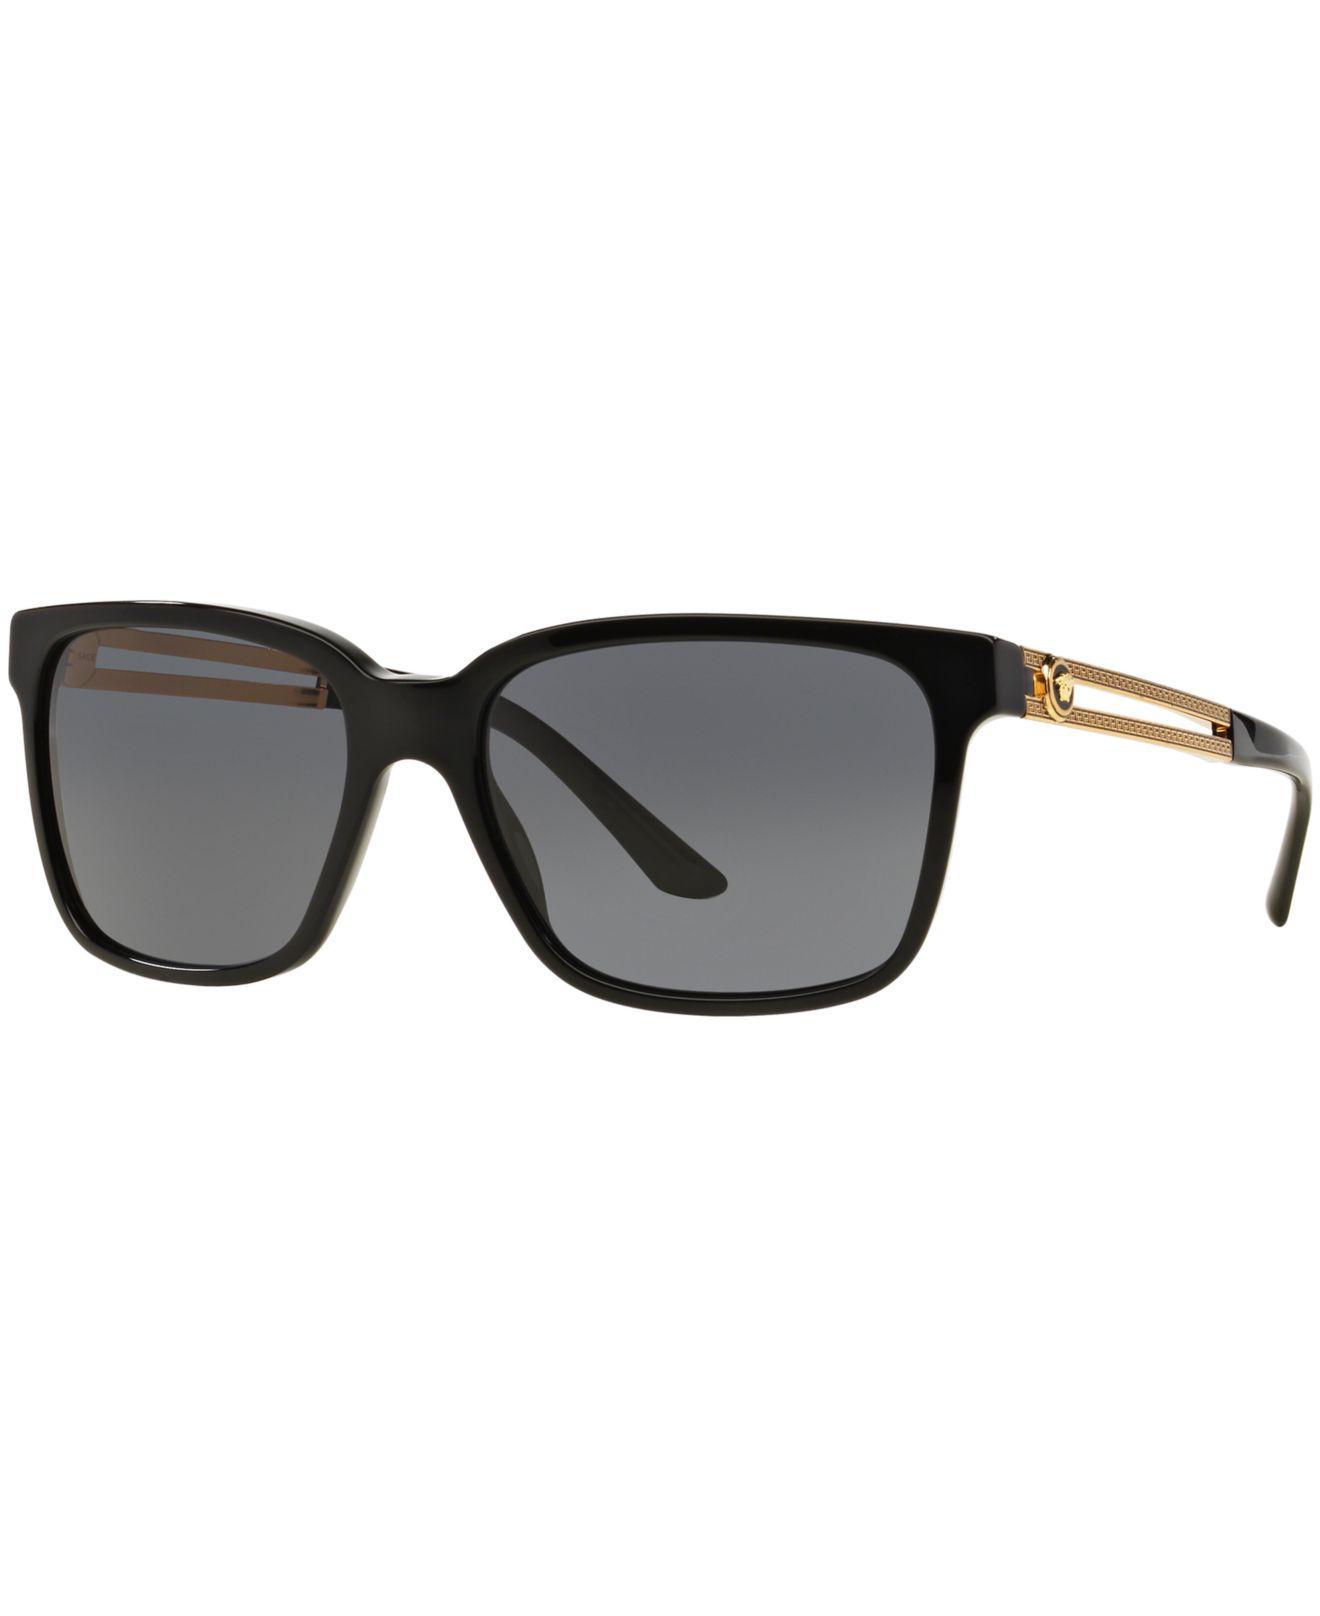 c909700161 Versace. Men s Black Sunglasses ...